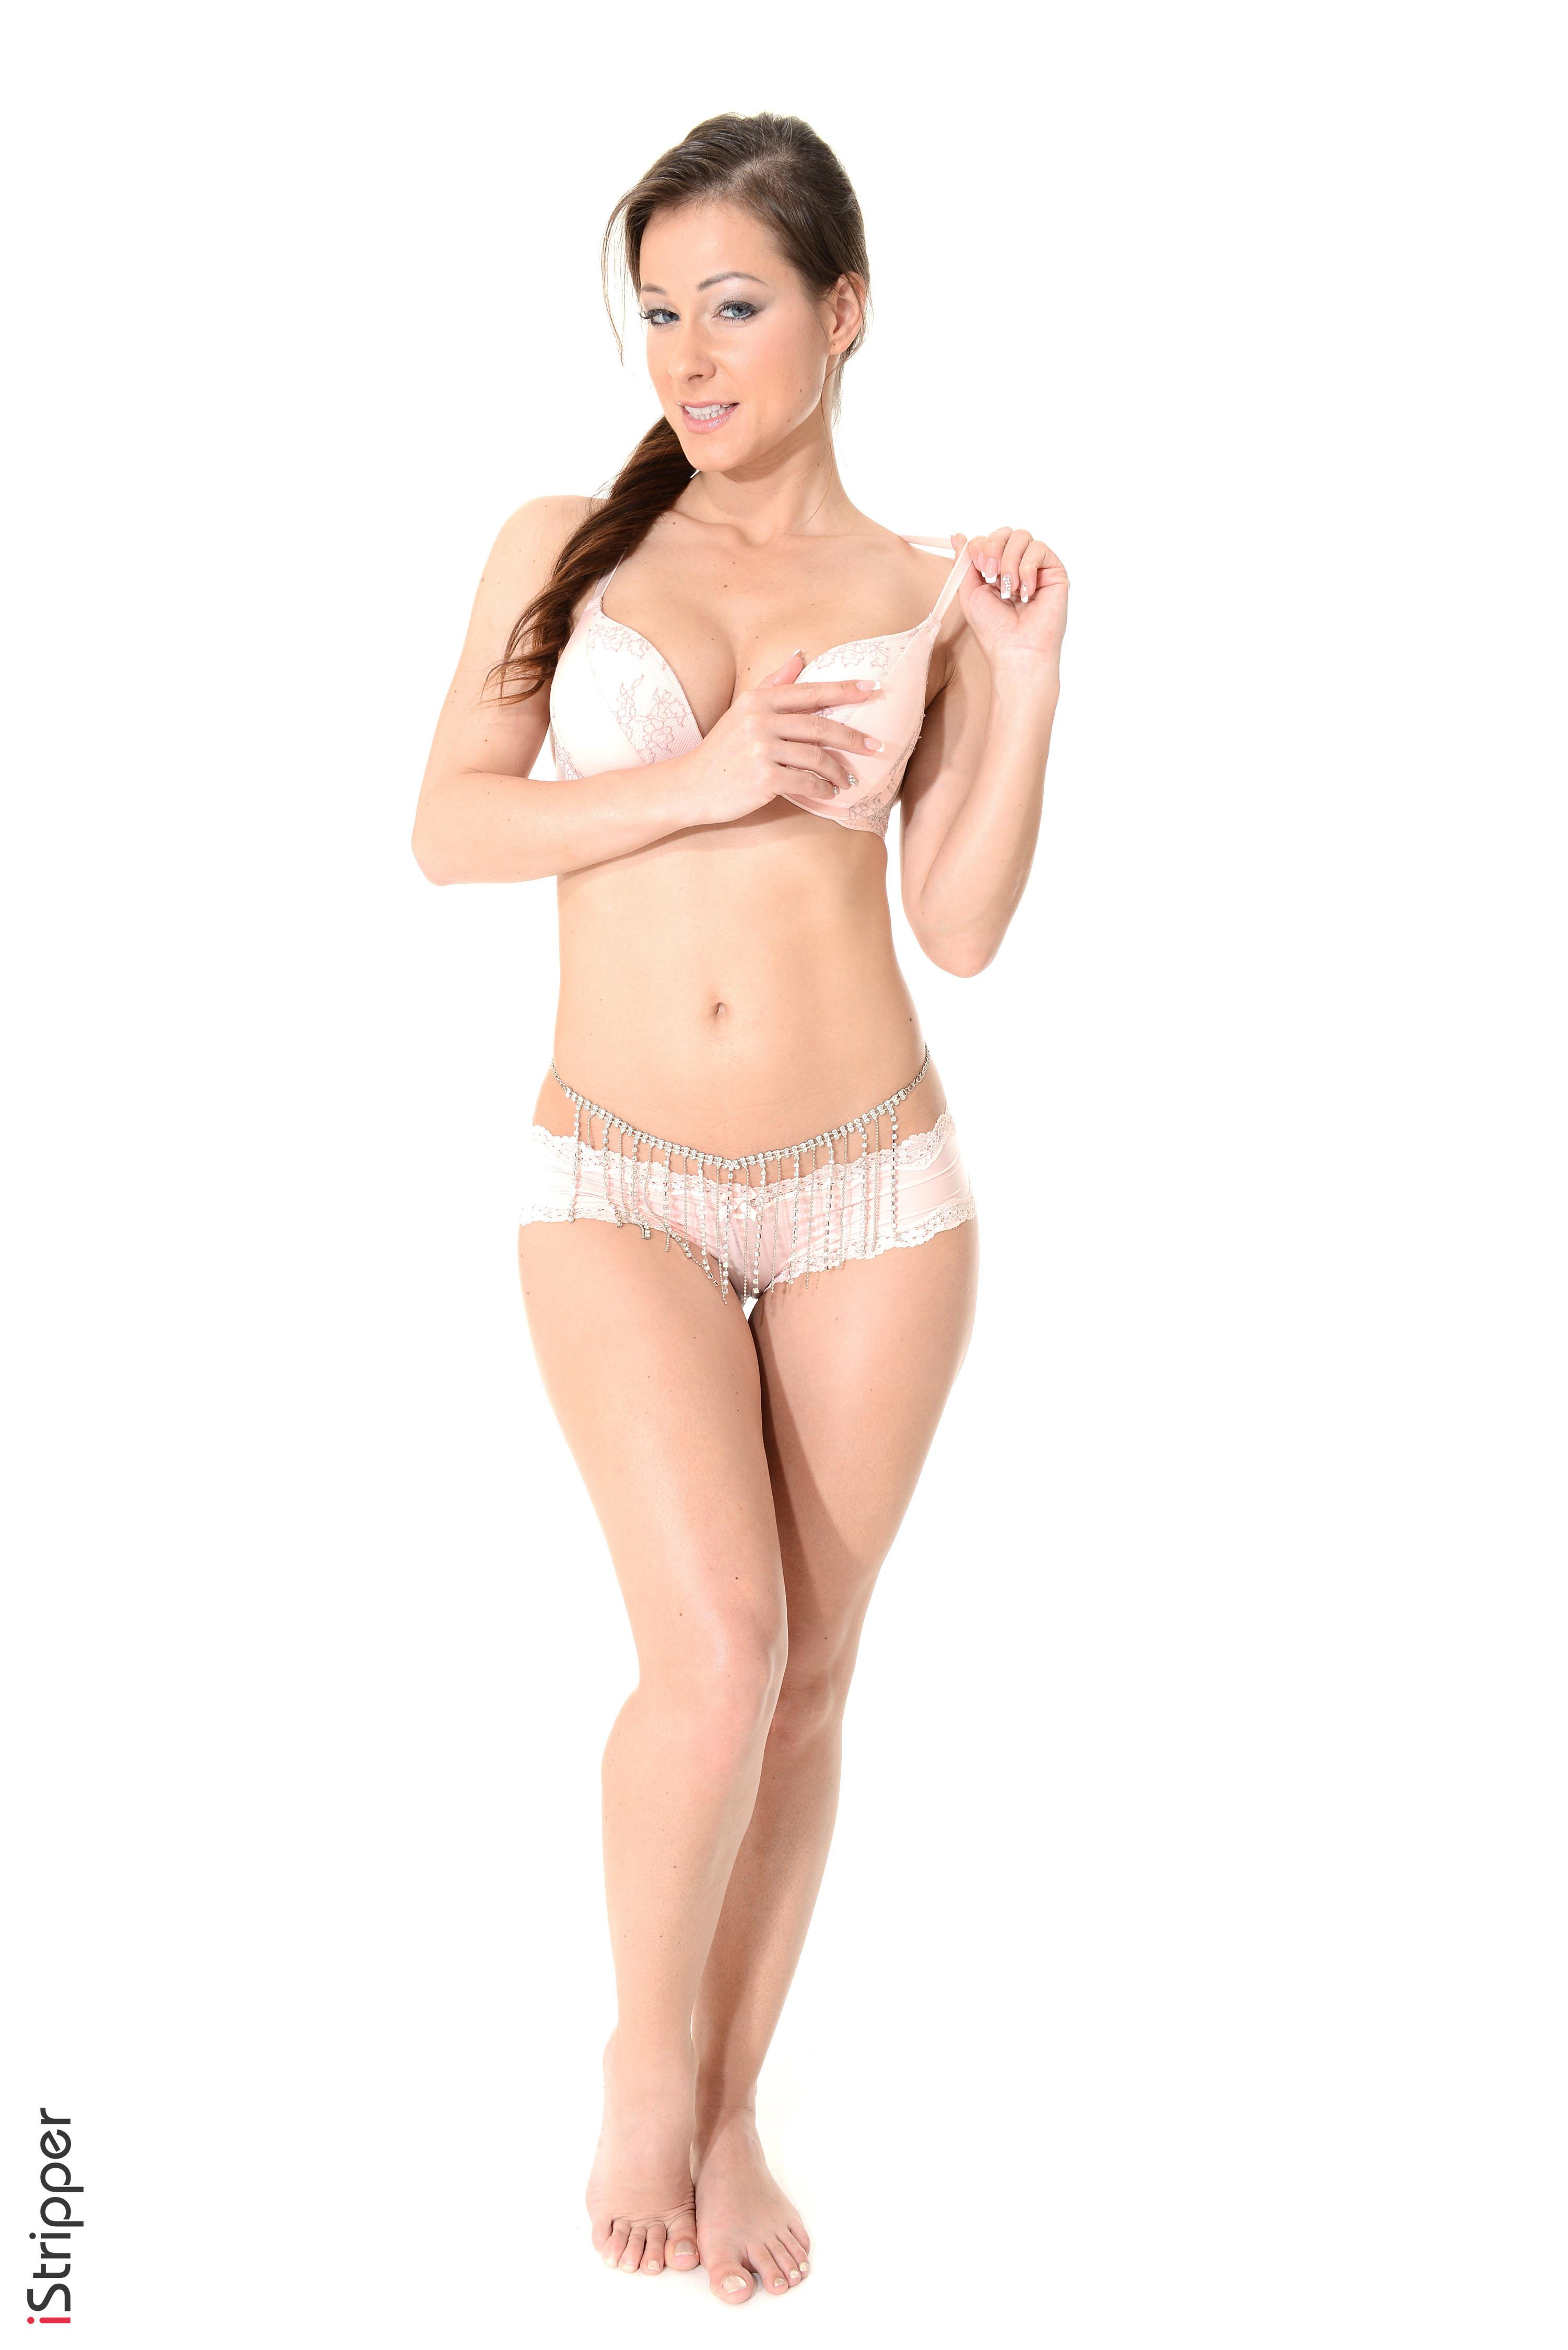 desktop stripper pic